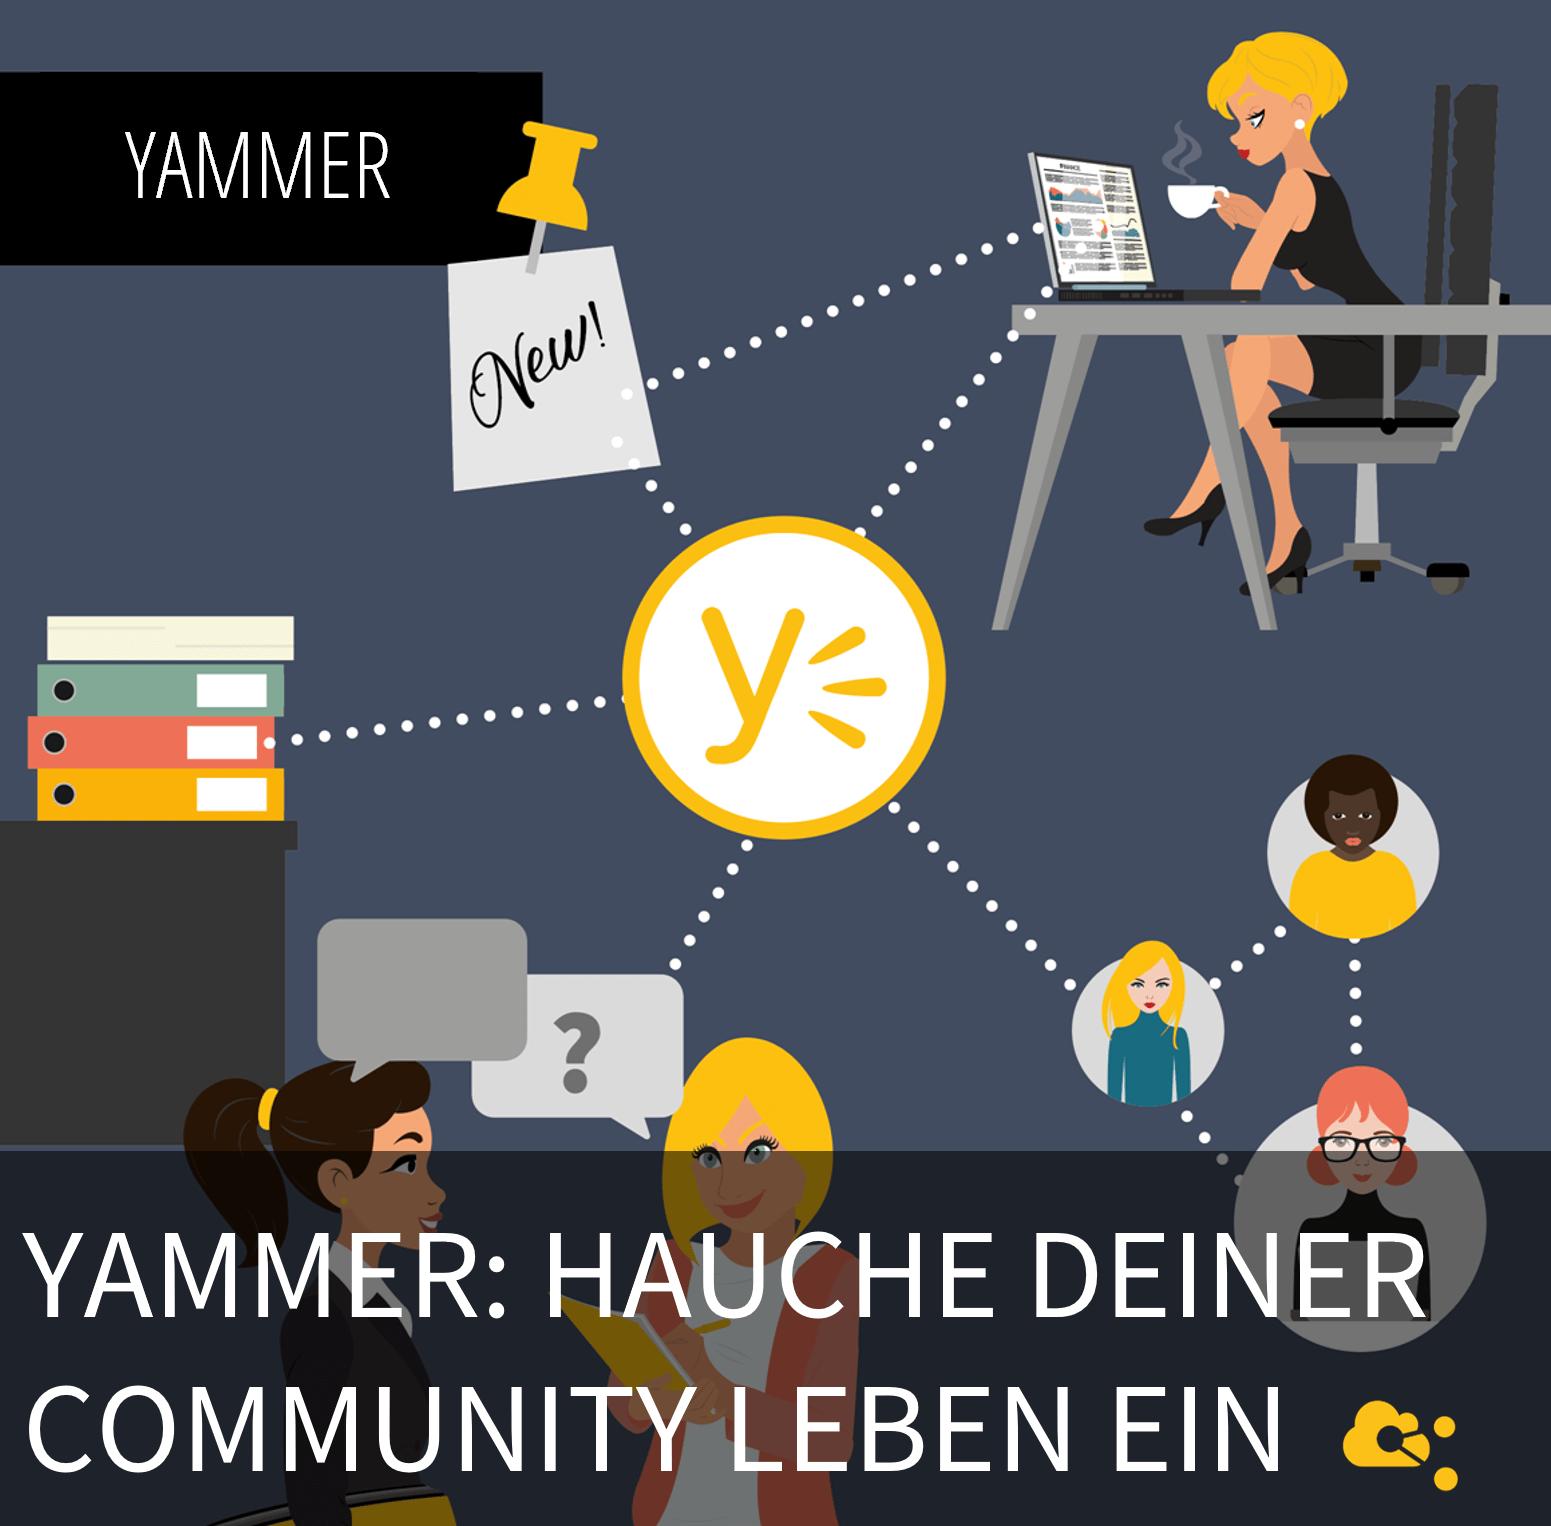 INSTA - Yammer - nuboRadio